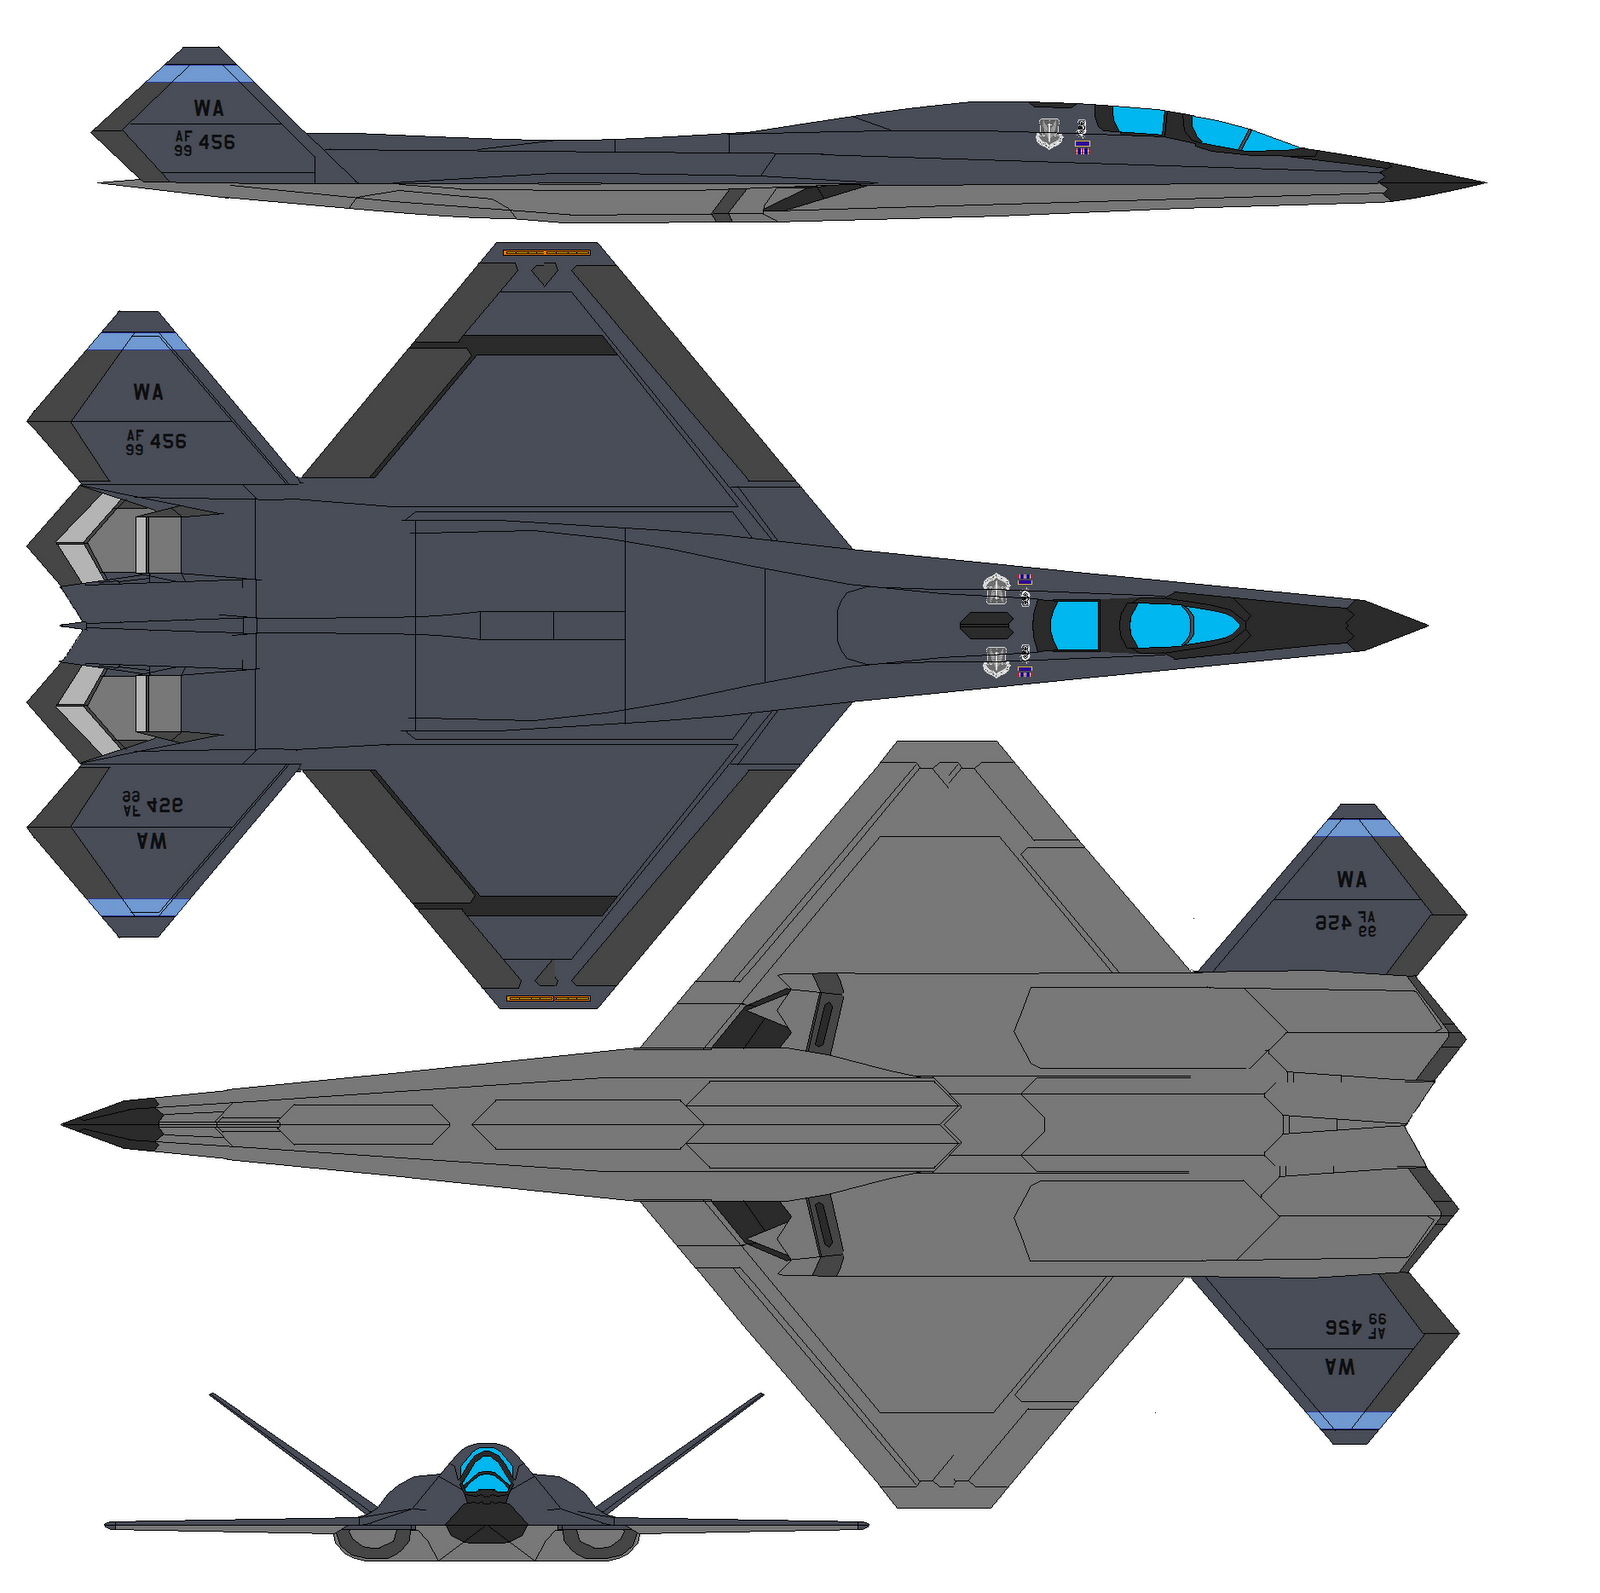 FUTURE ADF PAGE: The FB-23 Medium Bomber